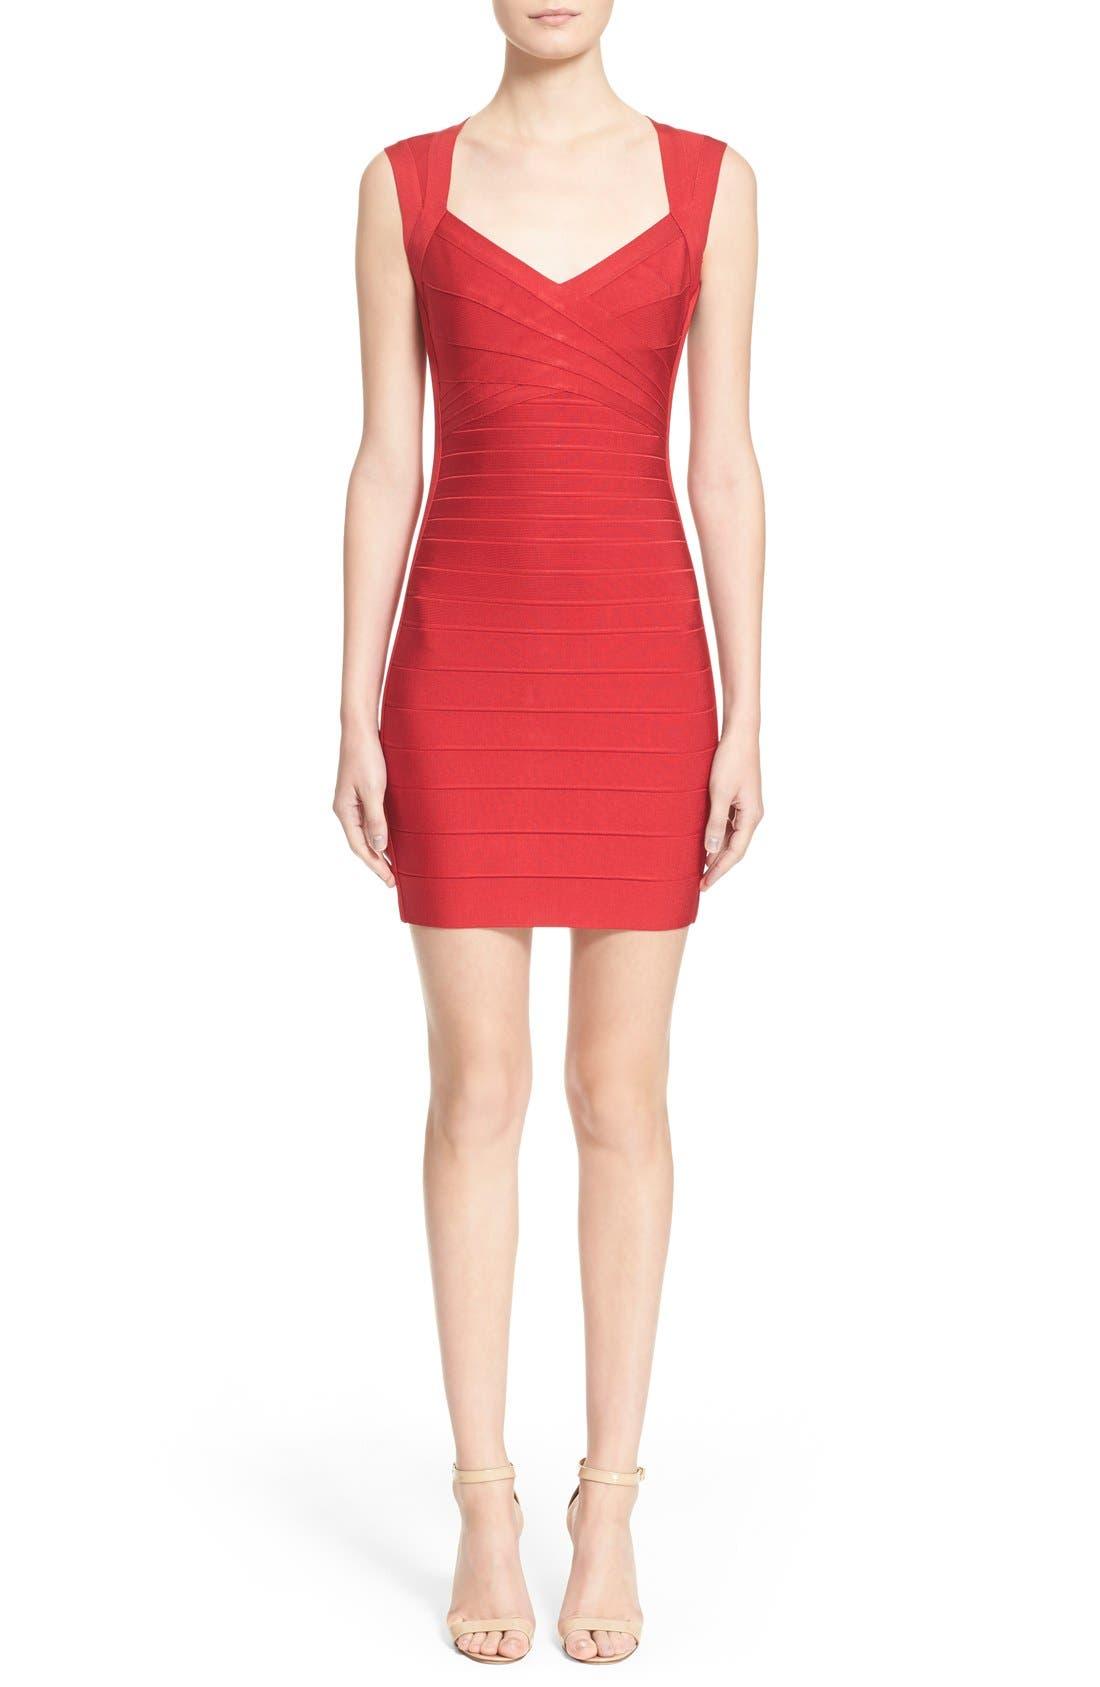 HERVE LEGER,                             Open Back Bandage Dress,                             Main thumbnail 1, color,                             616